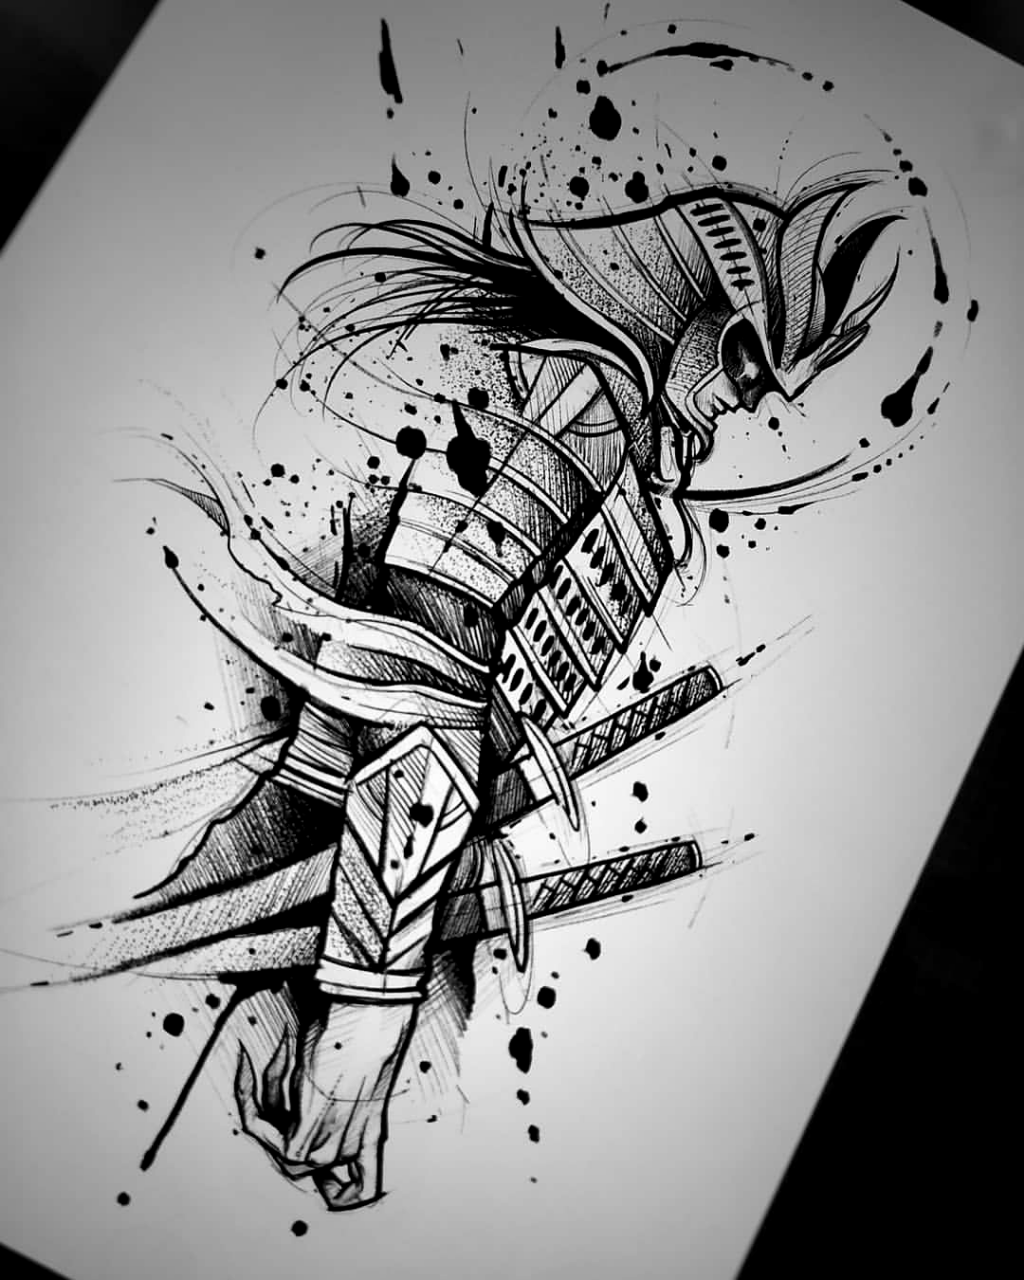 Epingle Par Aleksandara Sur Tatuaz En 2020 Tatouage Samurai Tatouage Samourai Tatouage